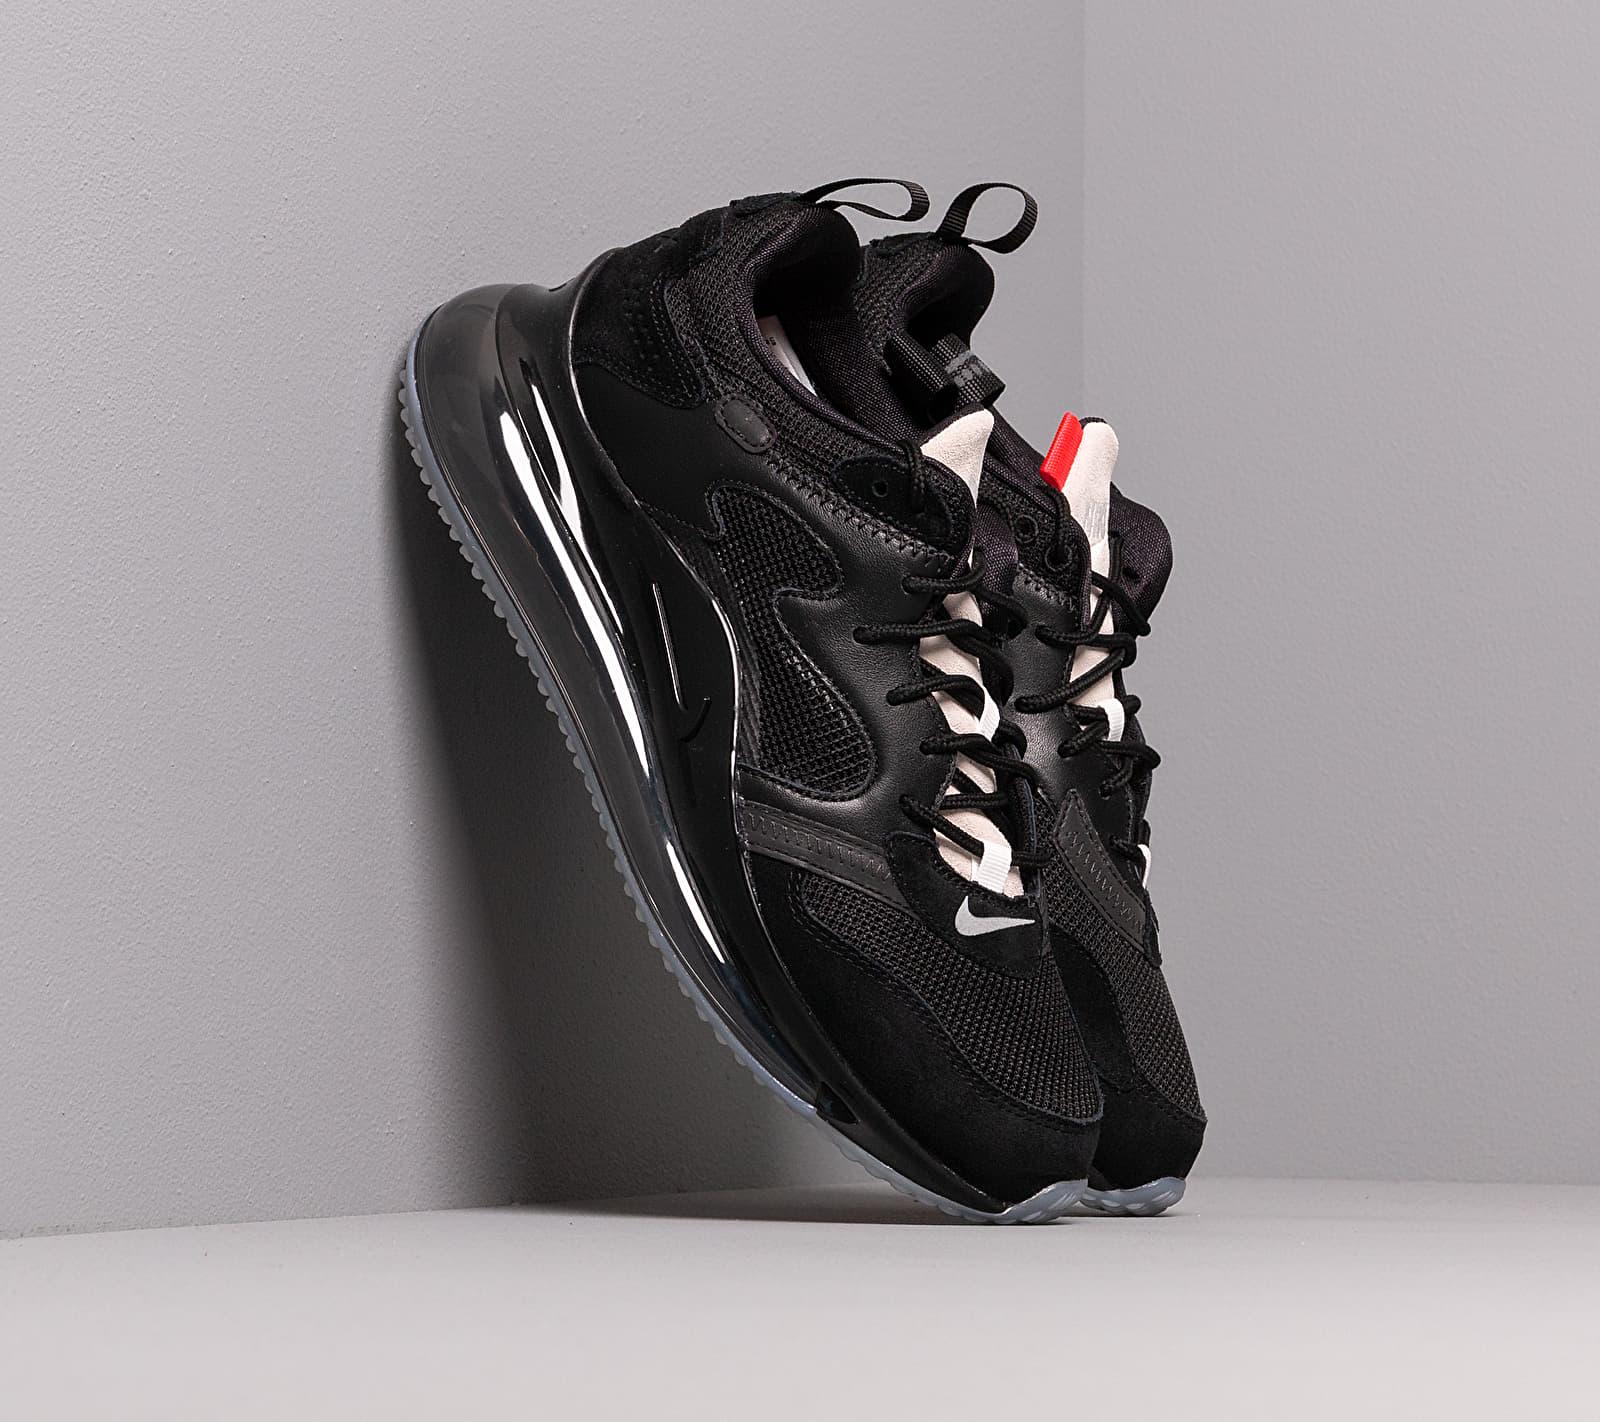 Nike Air Max 720 / Obj Black/ Summit White-Red Orbit CK2531-002